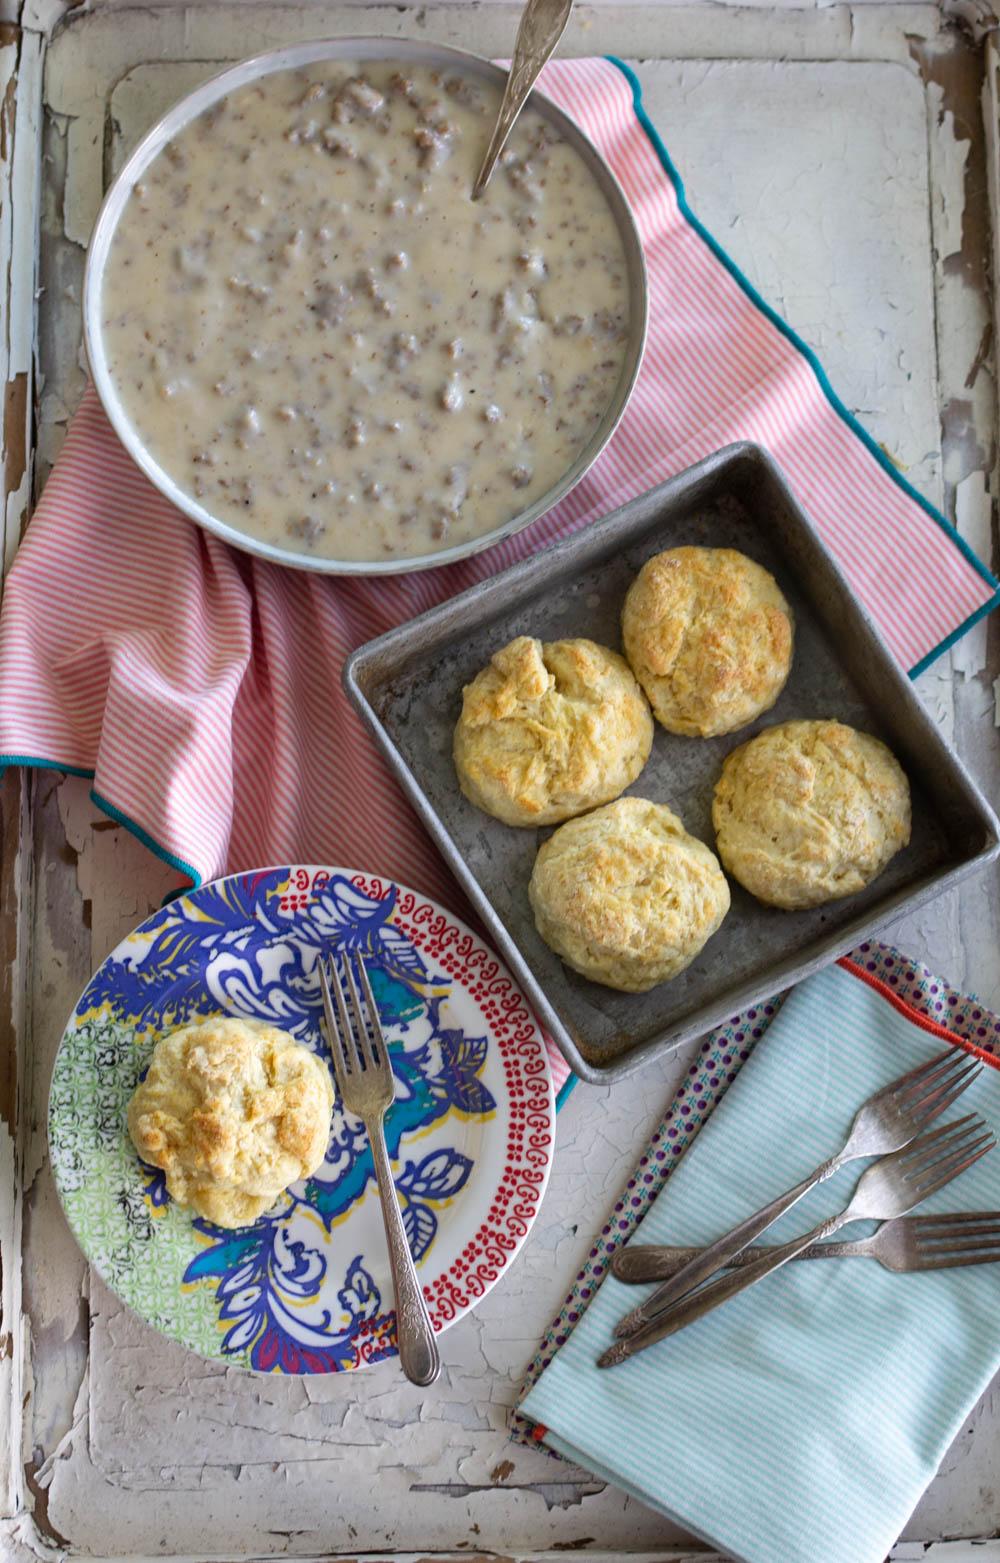 best biscuits and gravy recipe